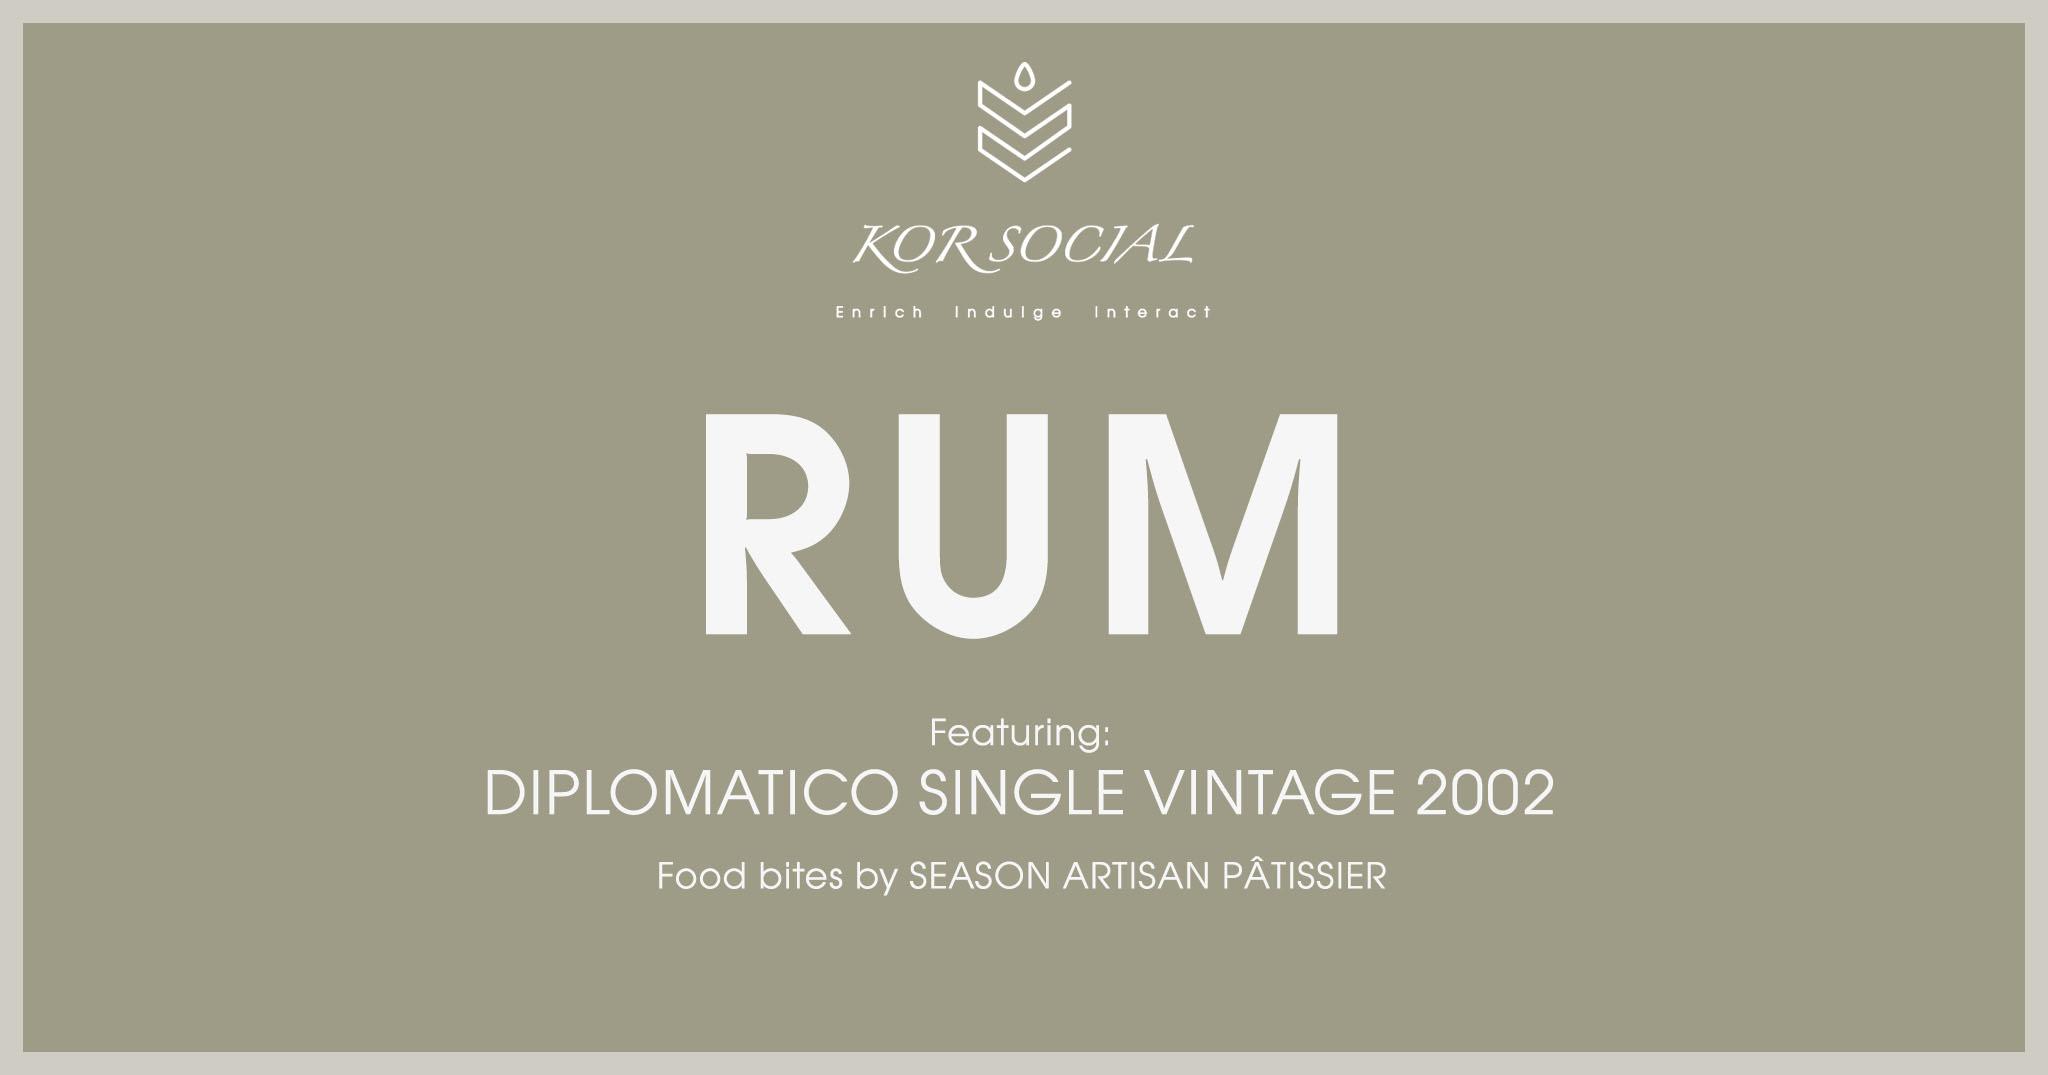 KOR Social - RUM Featuring DIPLOMATICO SINGLE VINTAGE 2002